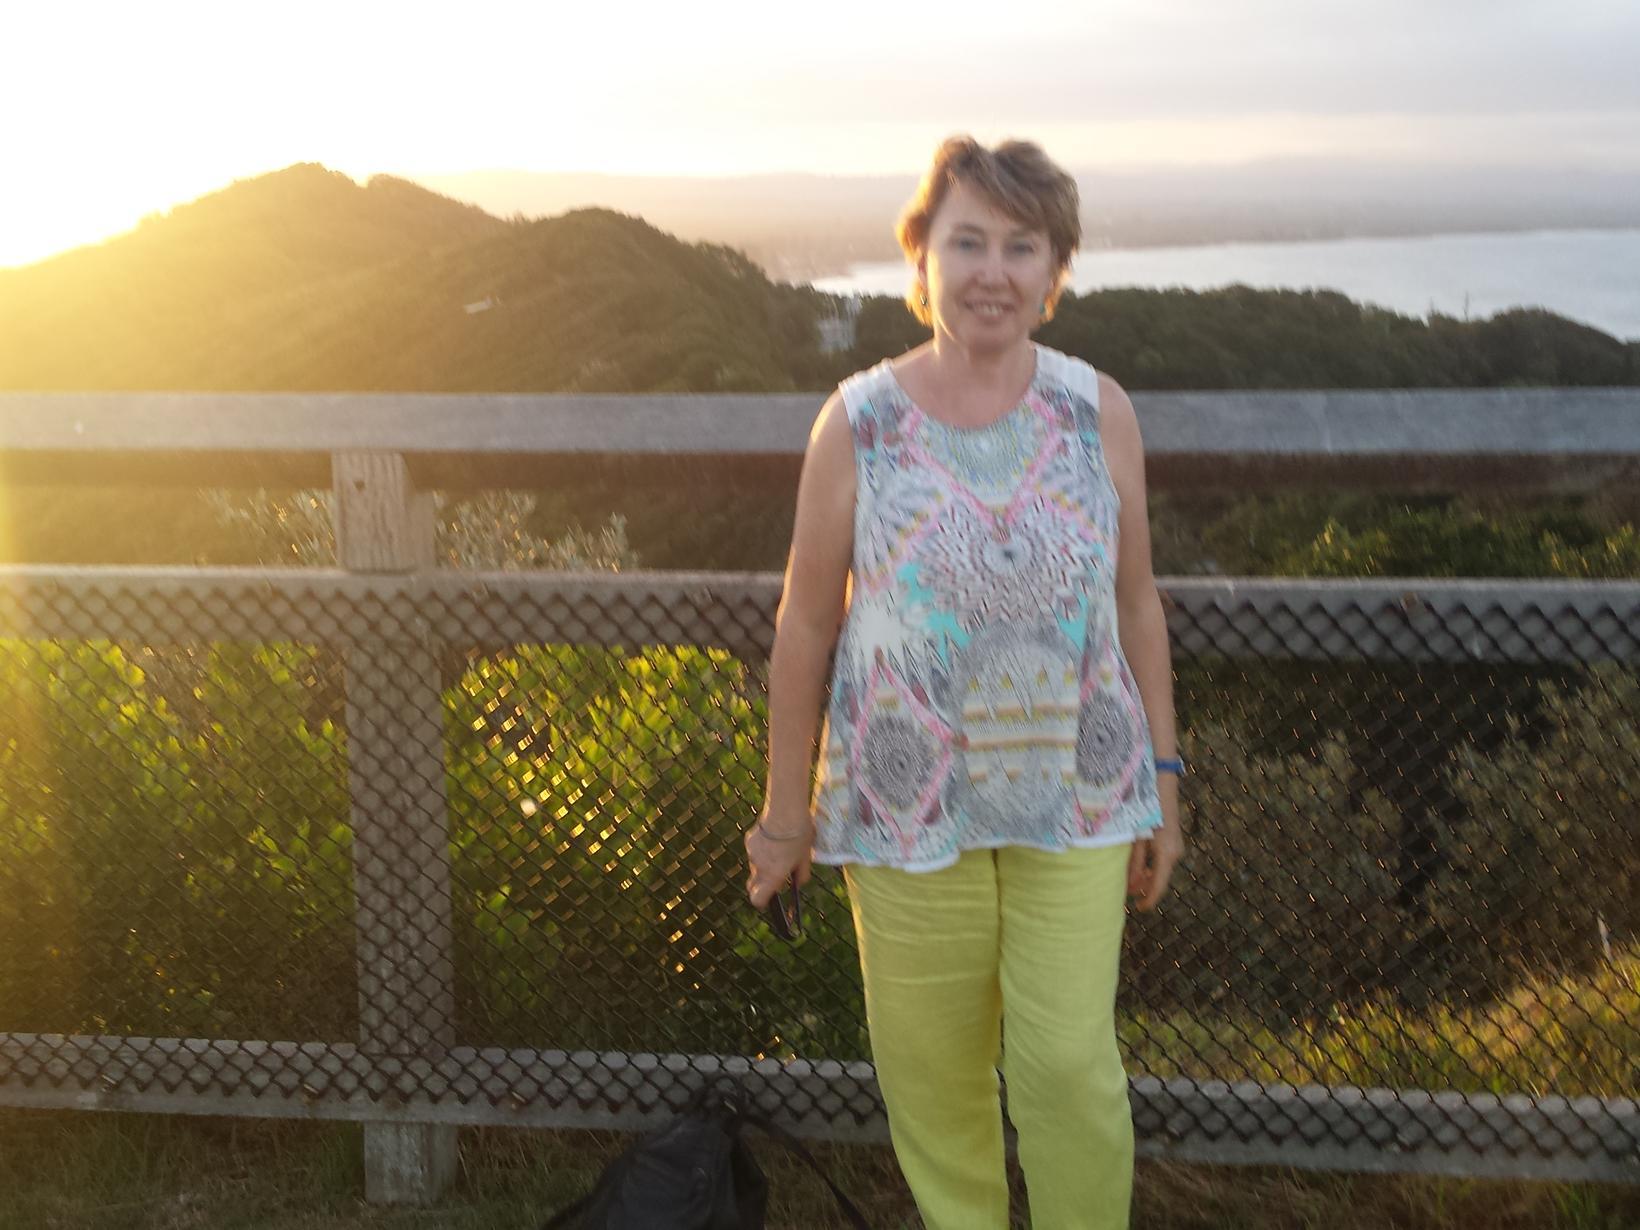 Lyn from Brisbane, Queensland, Australia